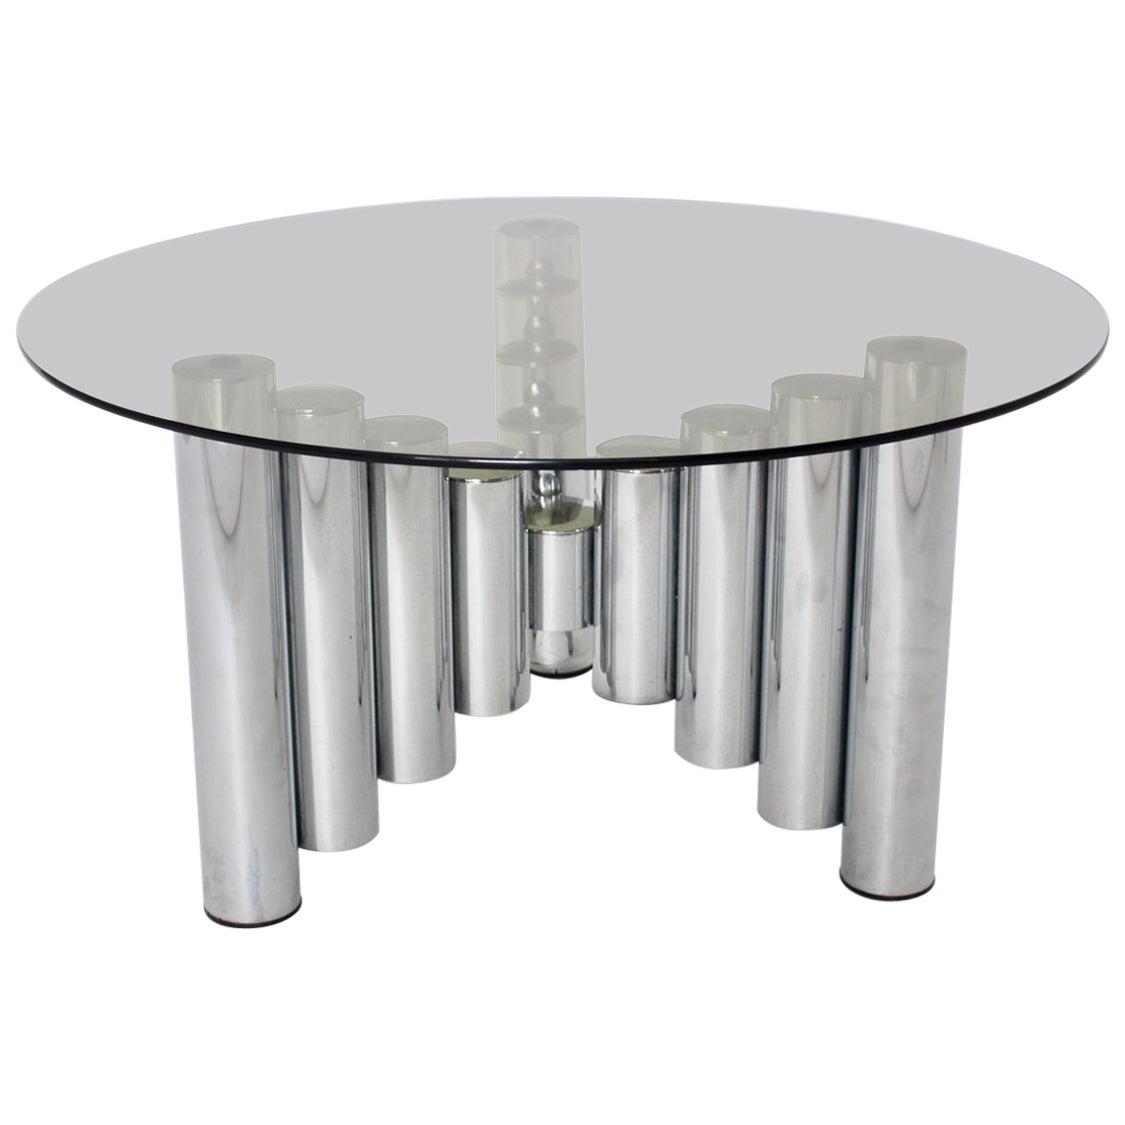 Mid Century Modern Vintage Chromed Tube Coffee Table Manhattan, 1960s